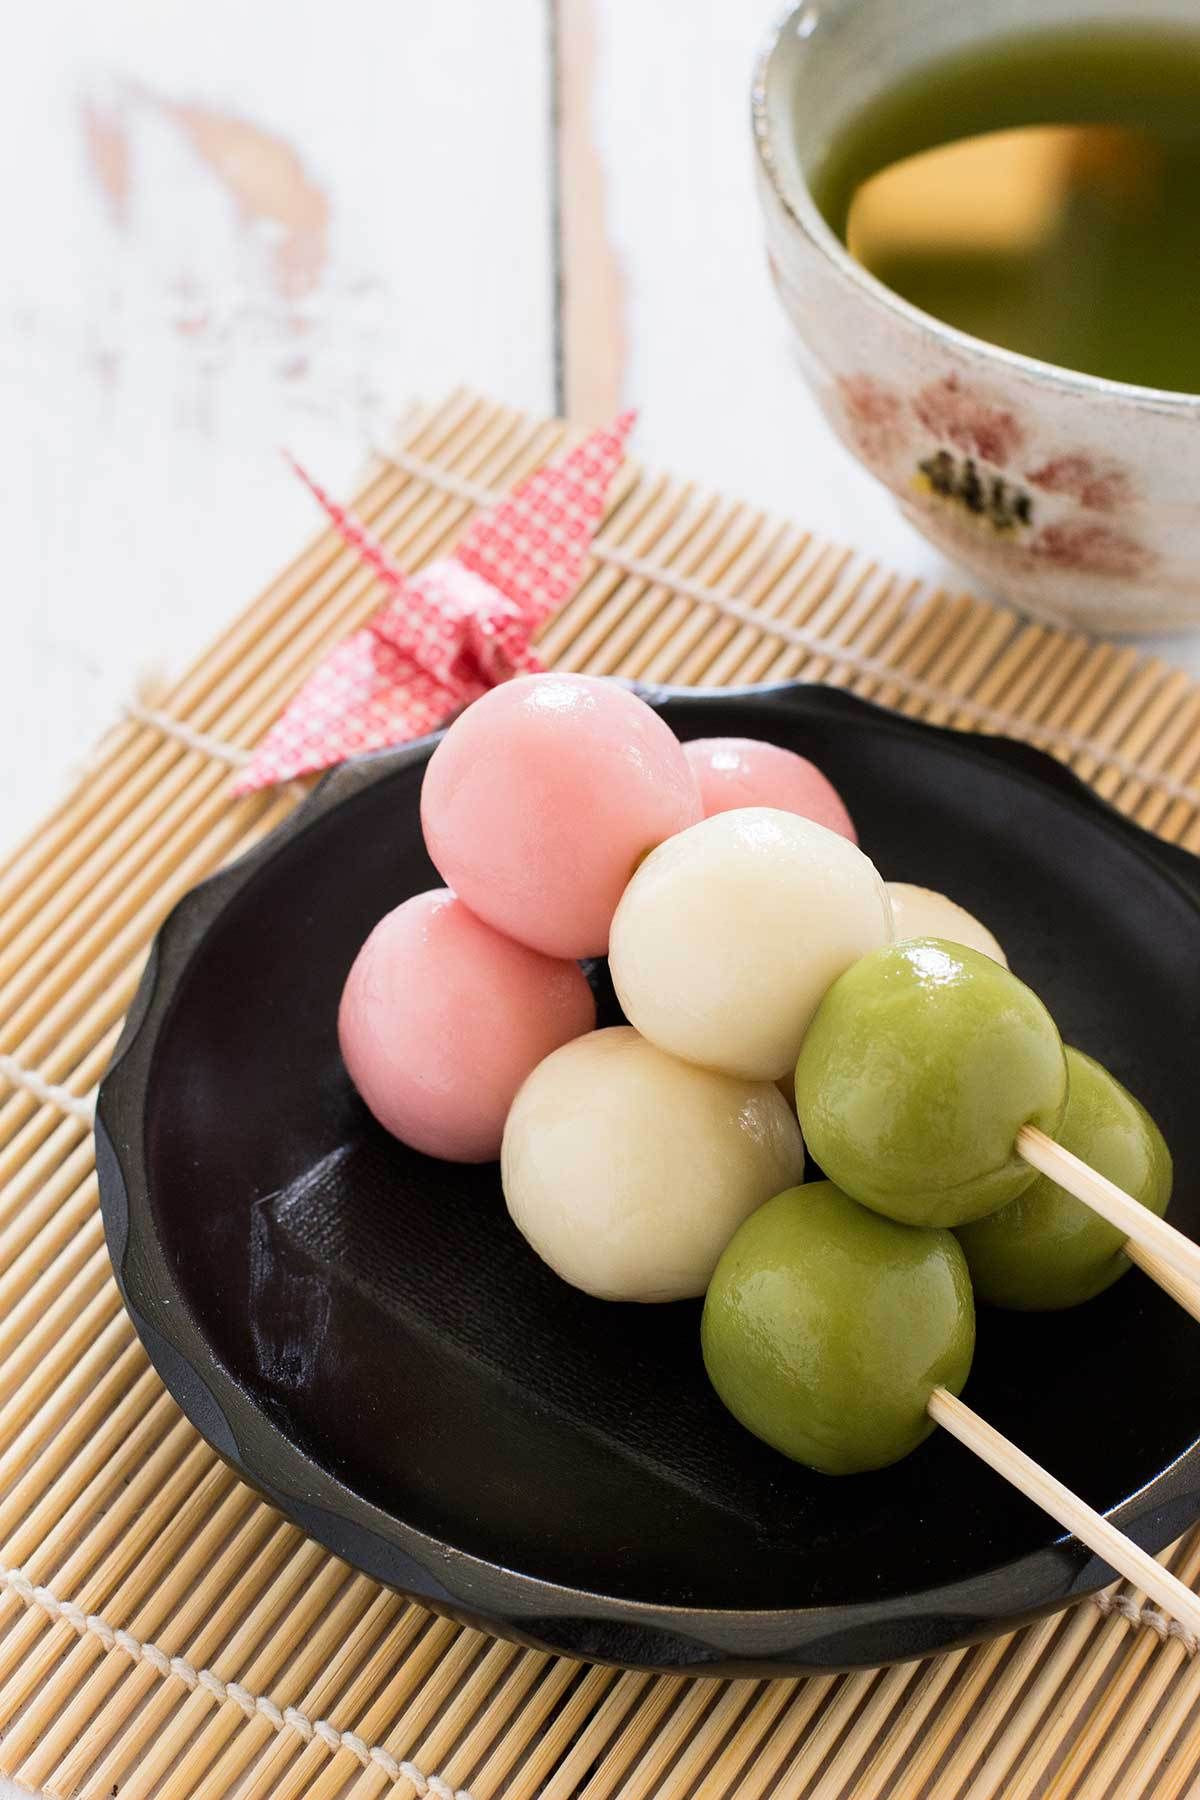 Dessert In Japanese  Sanshoku Dango kombuchaguru organic Also check out